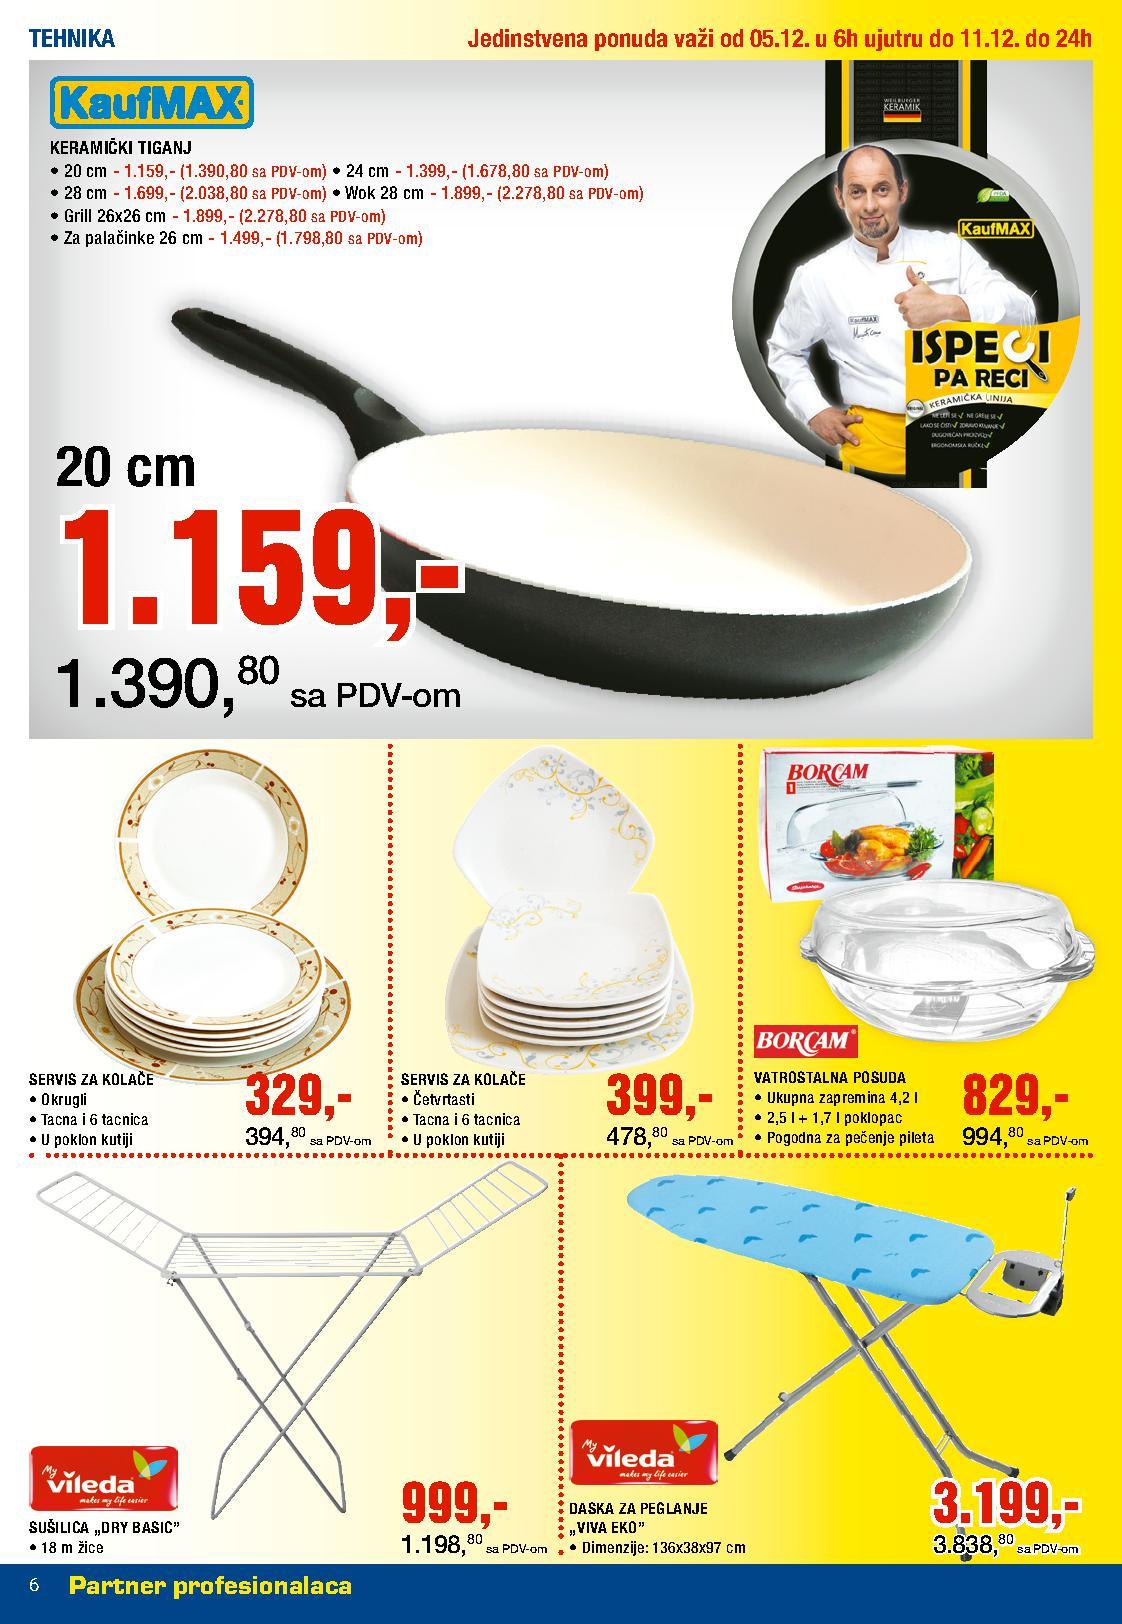 Metro katalog nedelja super  cena neprehrane